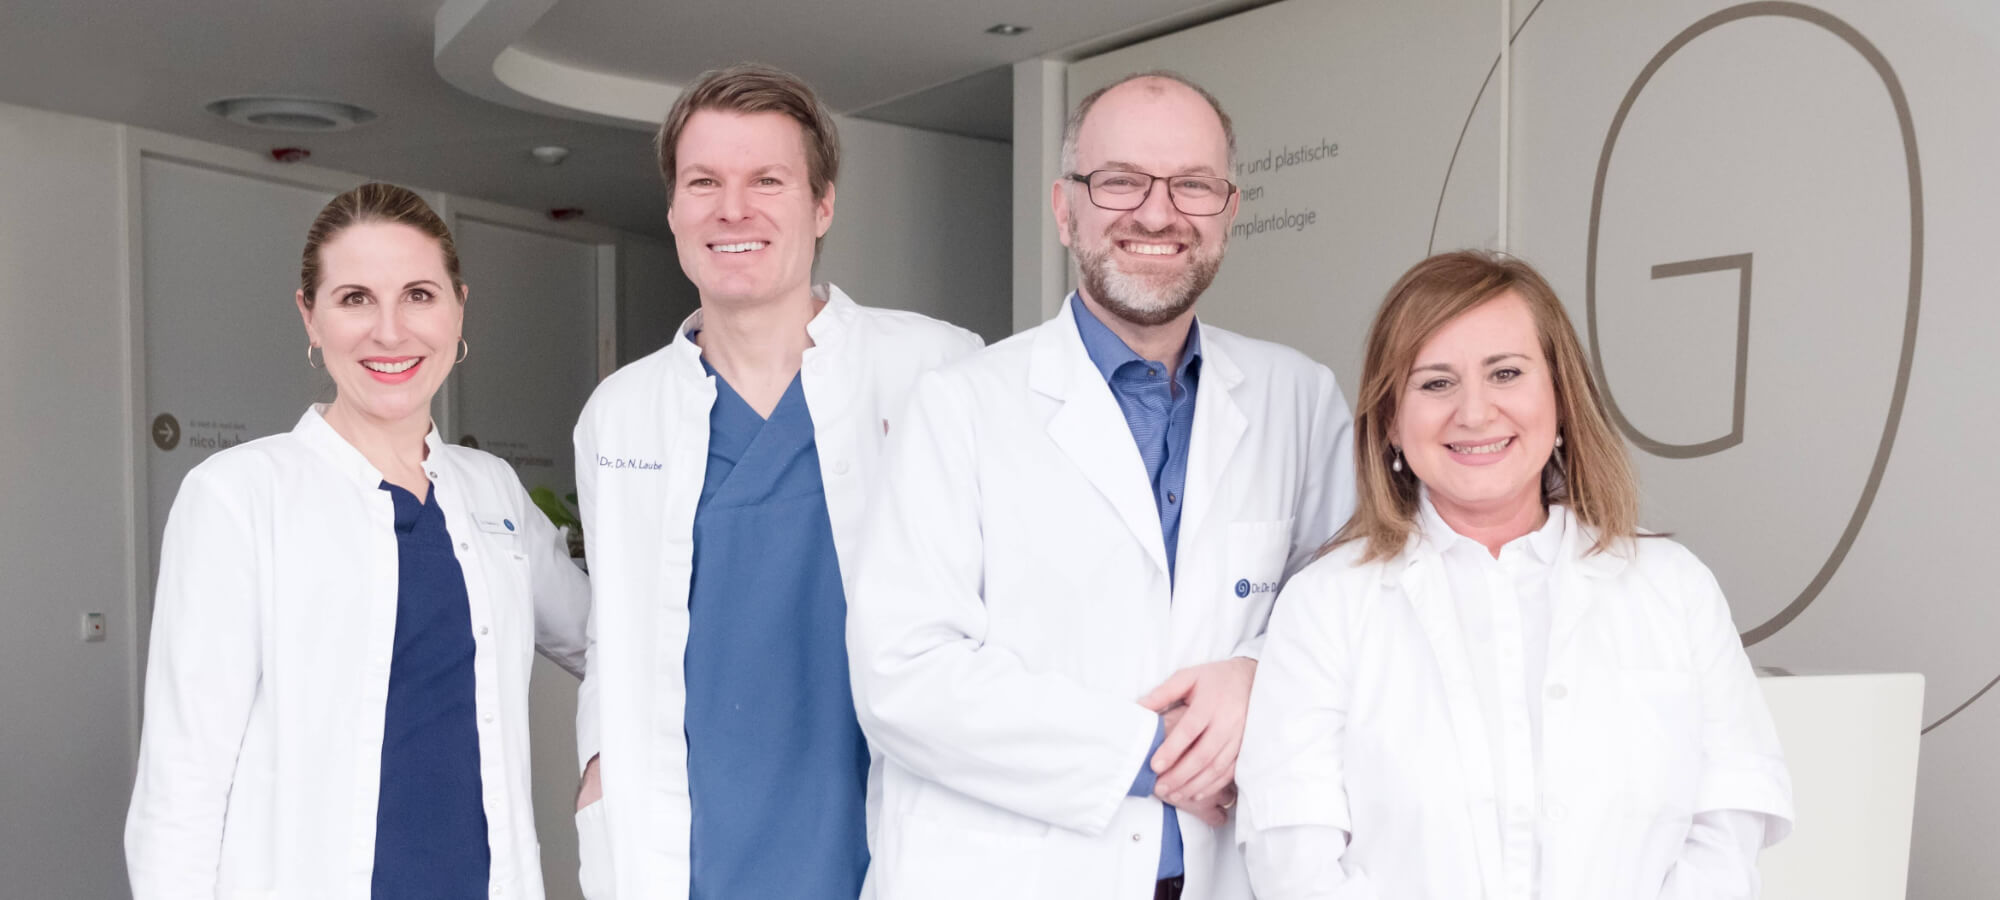 Ärzte Team   groisman & laube Frankfurt